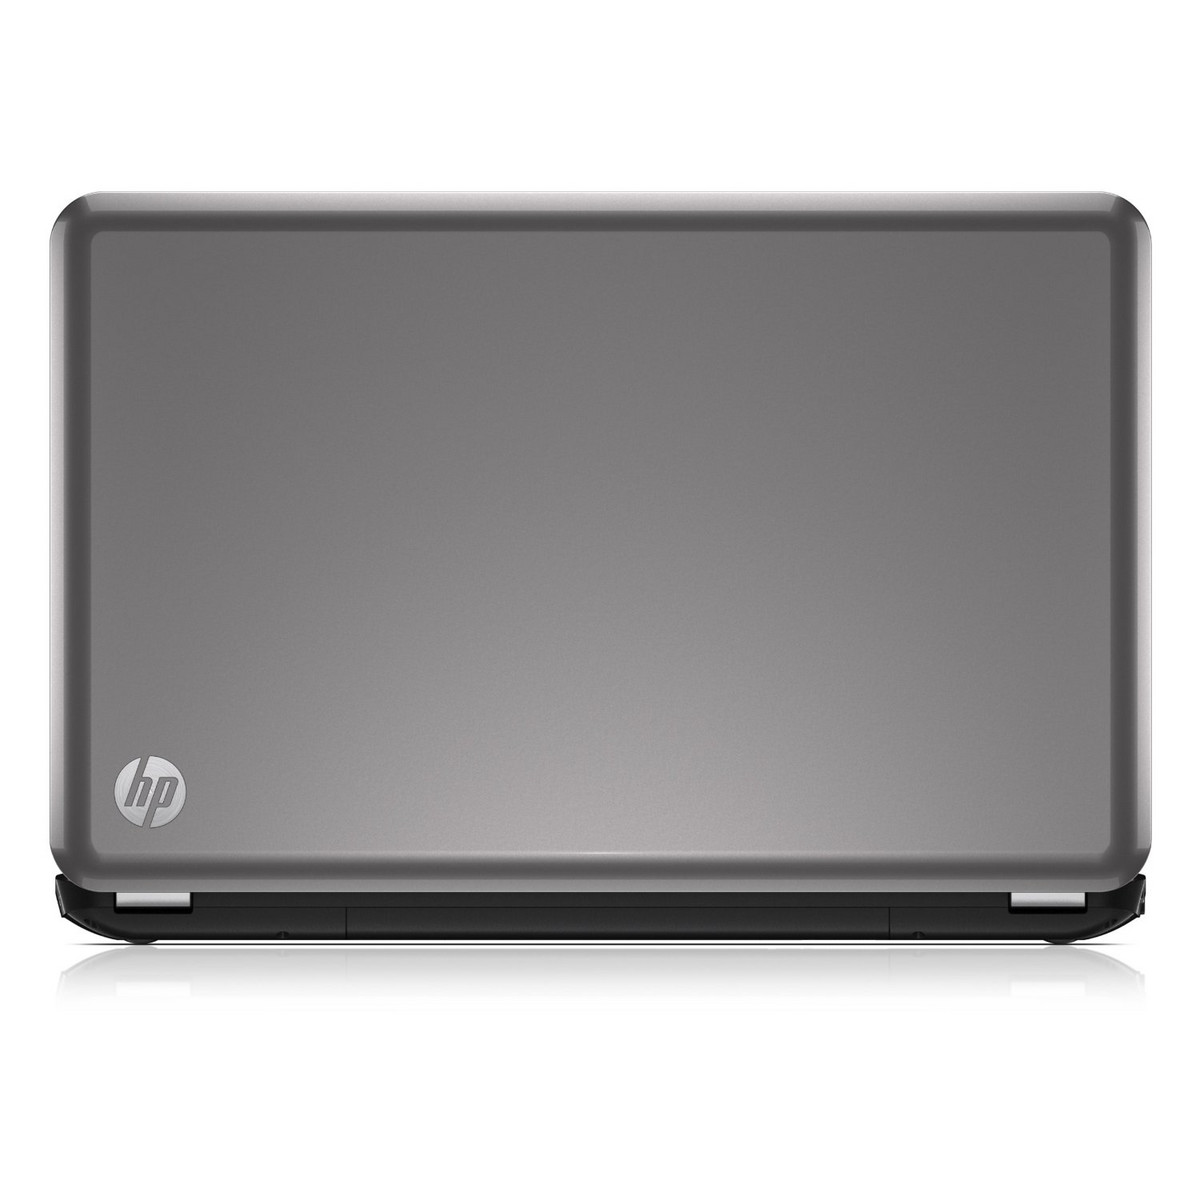 HP G42-301NR NOTEBOOK ATI MOBILITY RADEON HD VGA 64BIT DRIVER